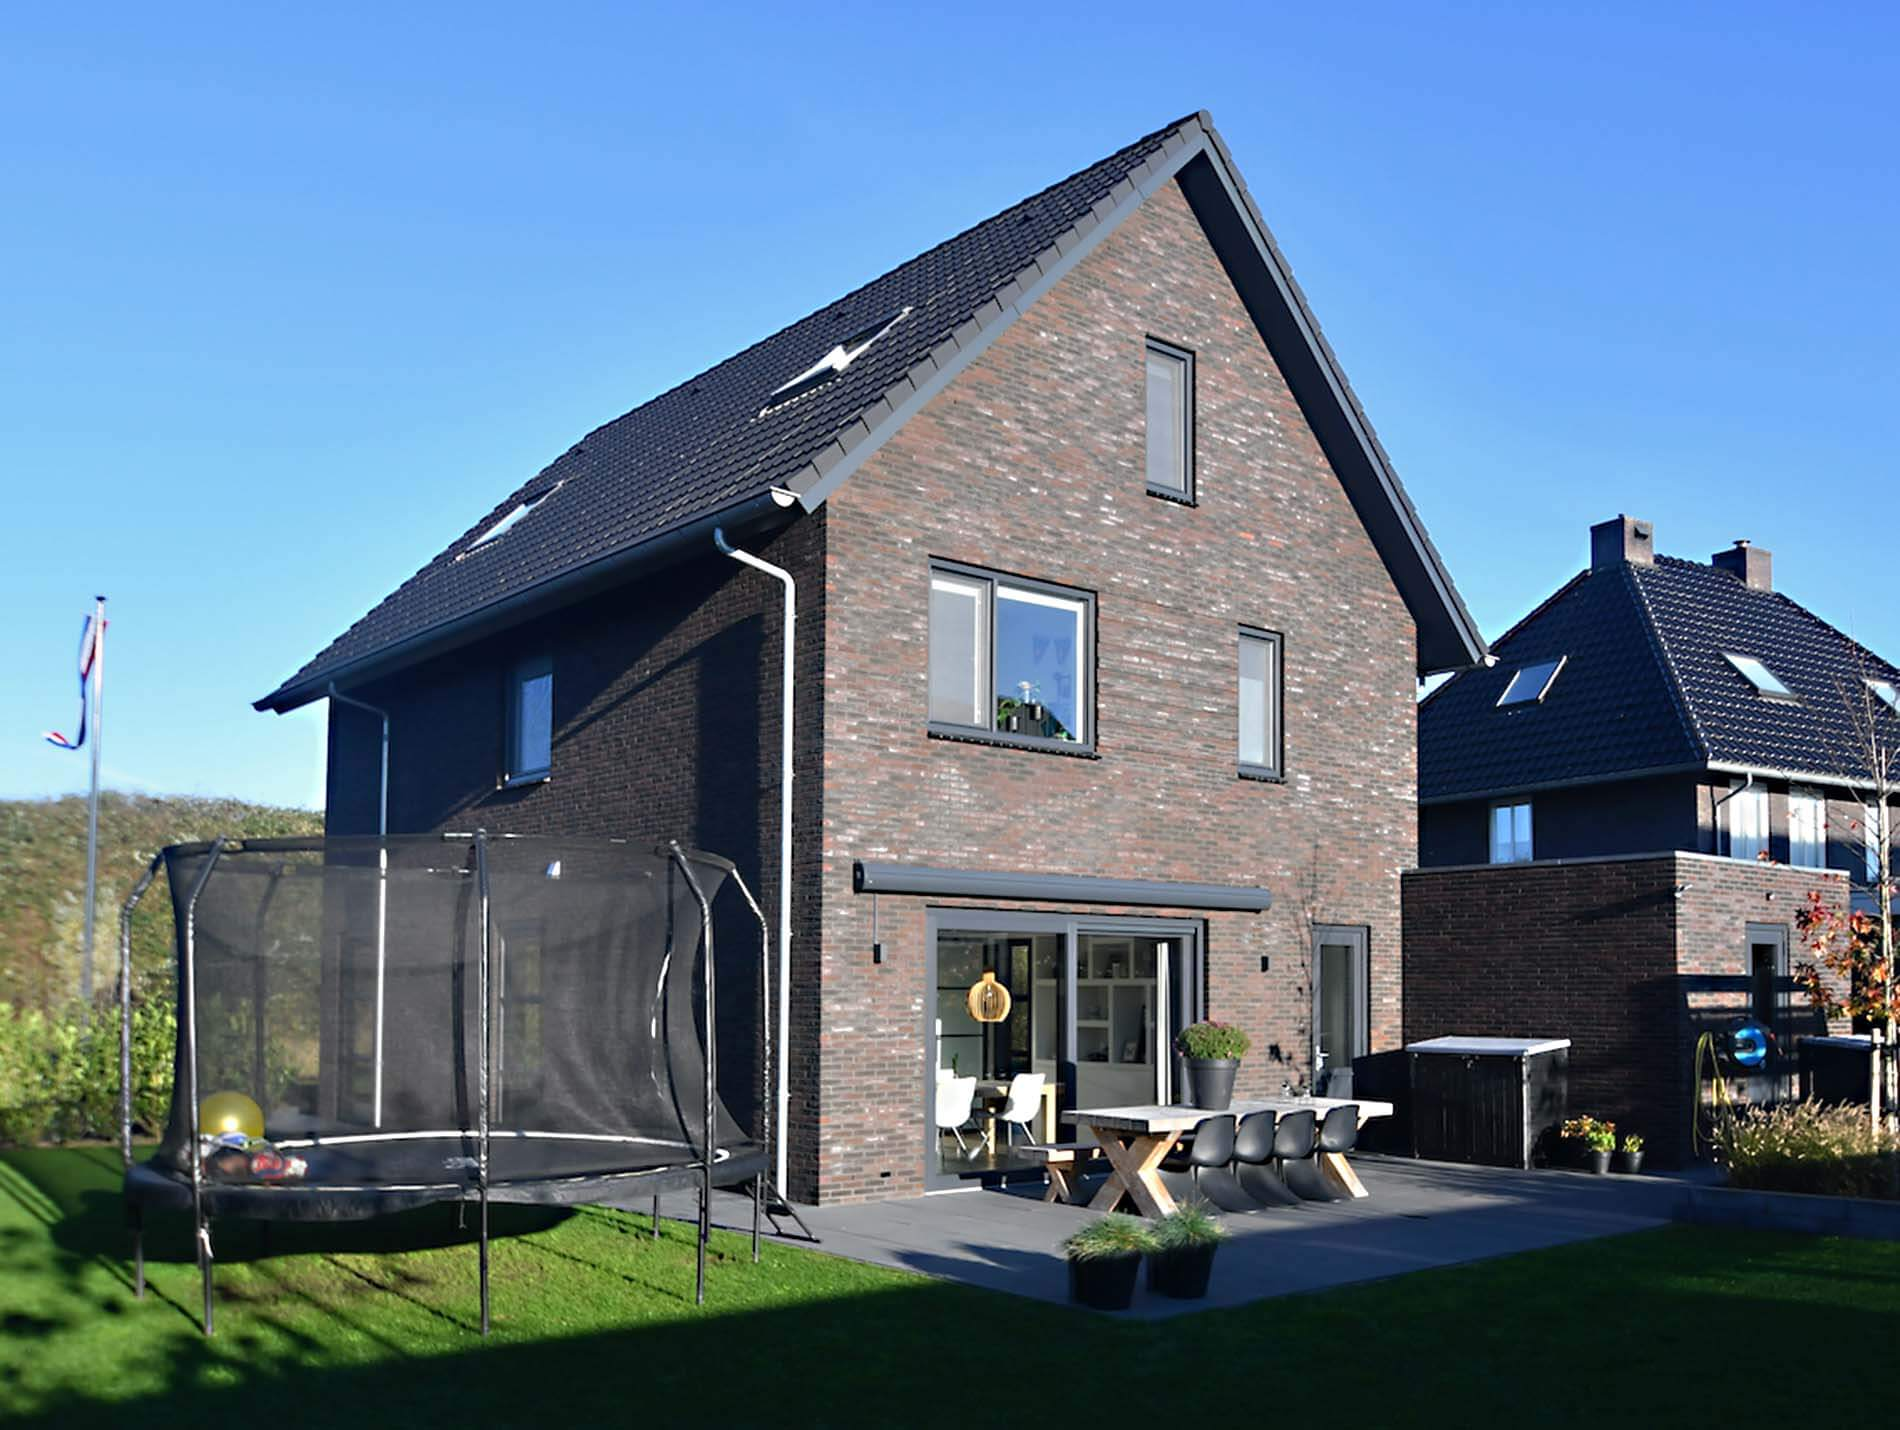 16. Drachten-nieuwbouw-woning-1900x1430p.jpg